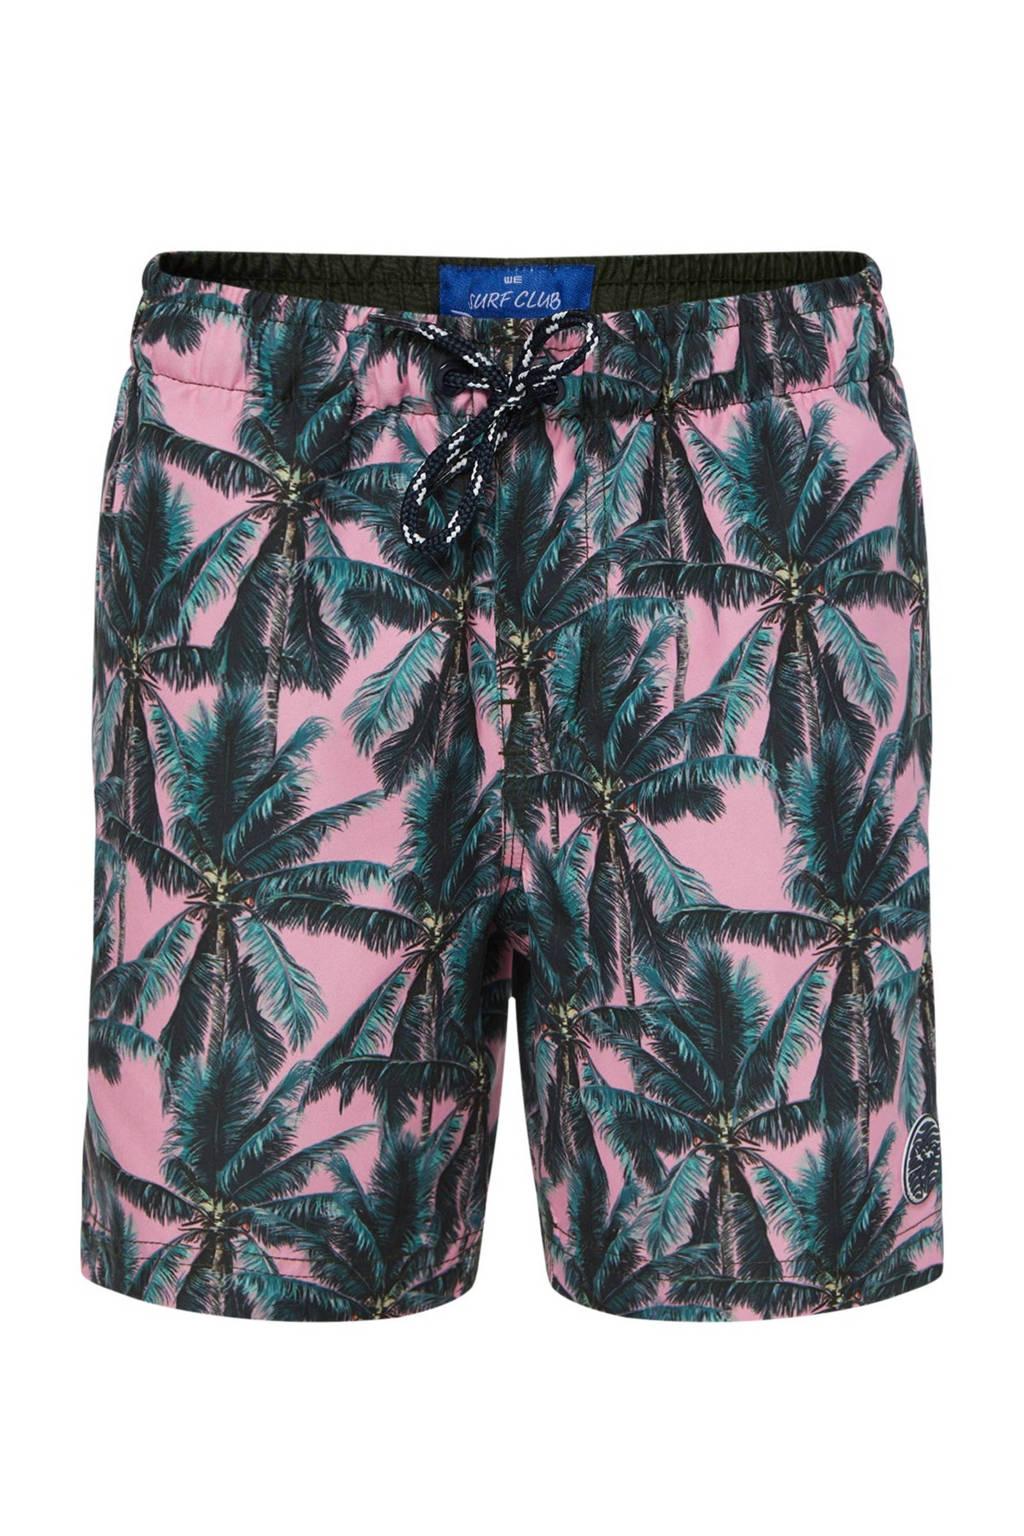 WE Fashion zwemshort met all over print roze/groen, No Color